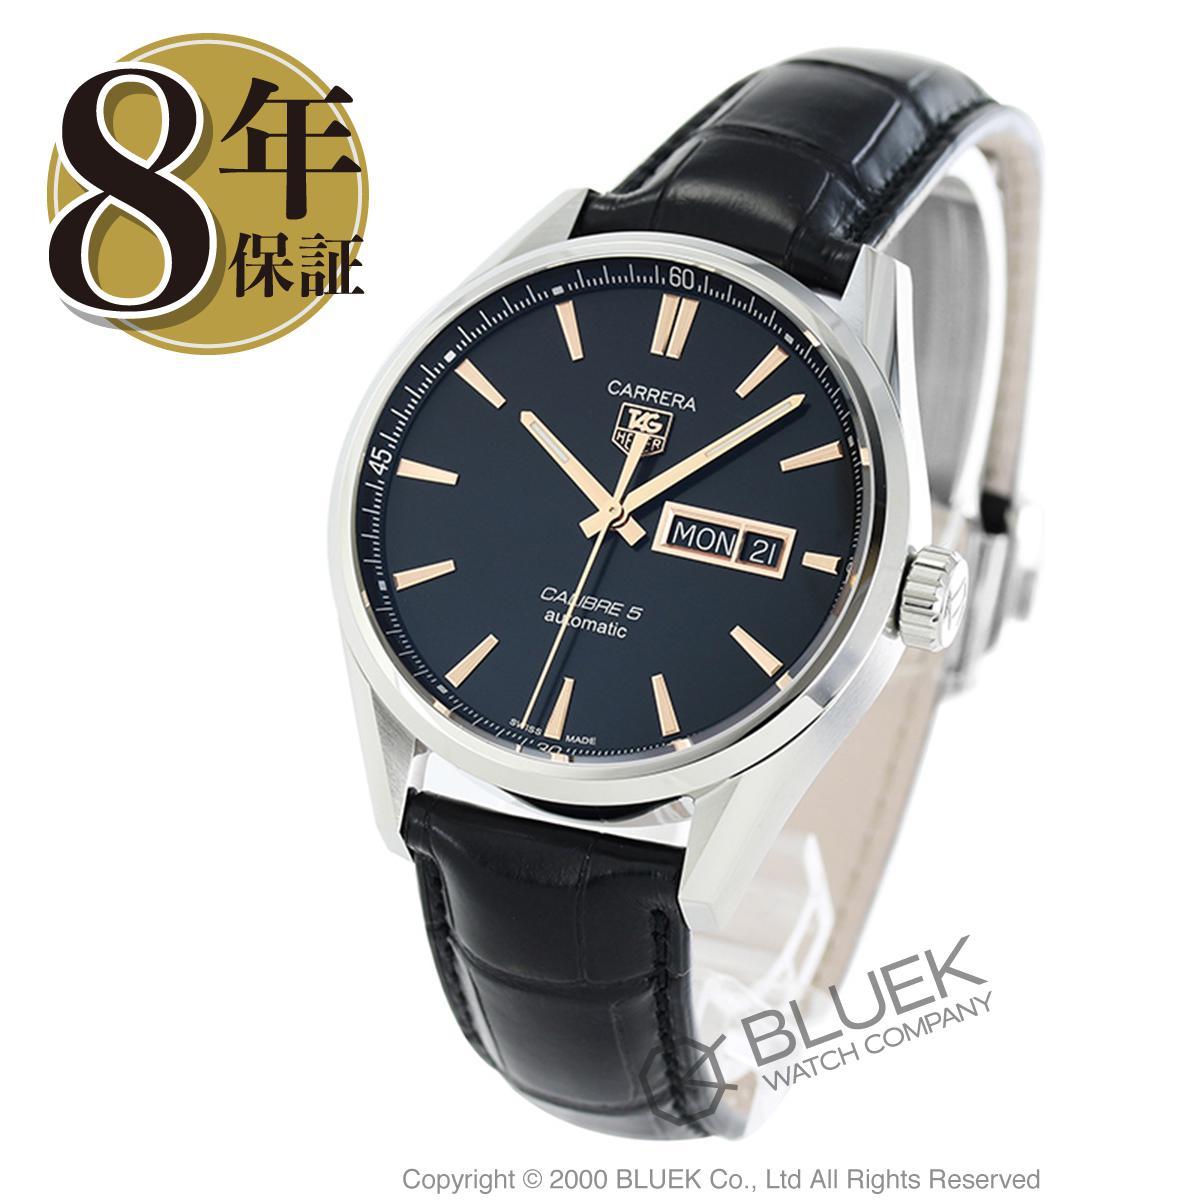 new styles c4895 e107f タグホイヤー カレラ アリゲーターレザー 腕時計 メンズ TAG ...